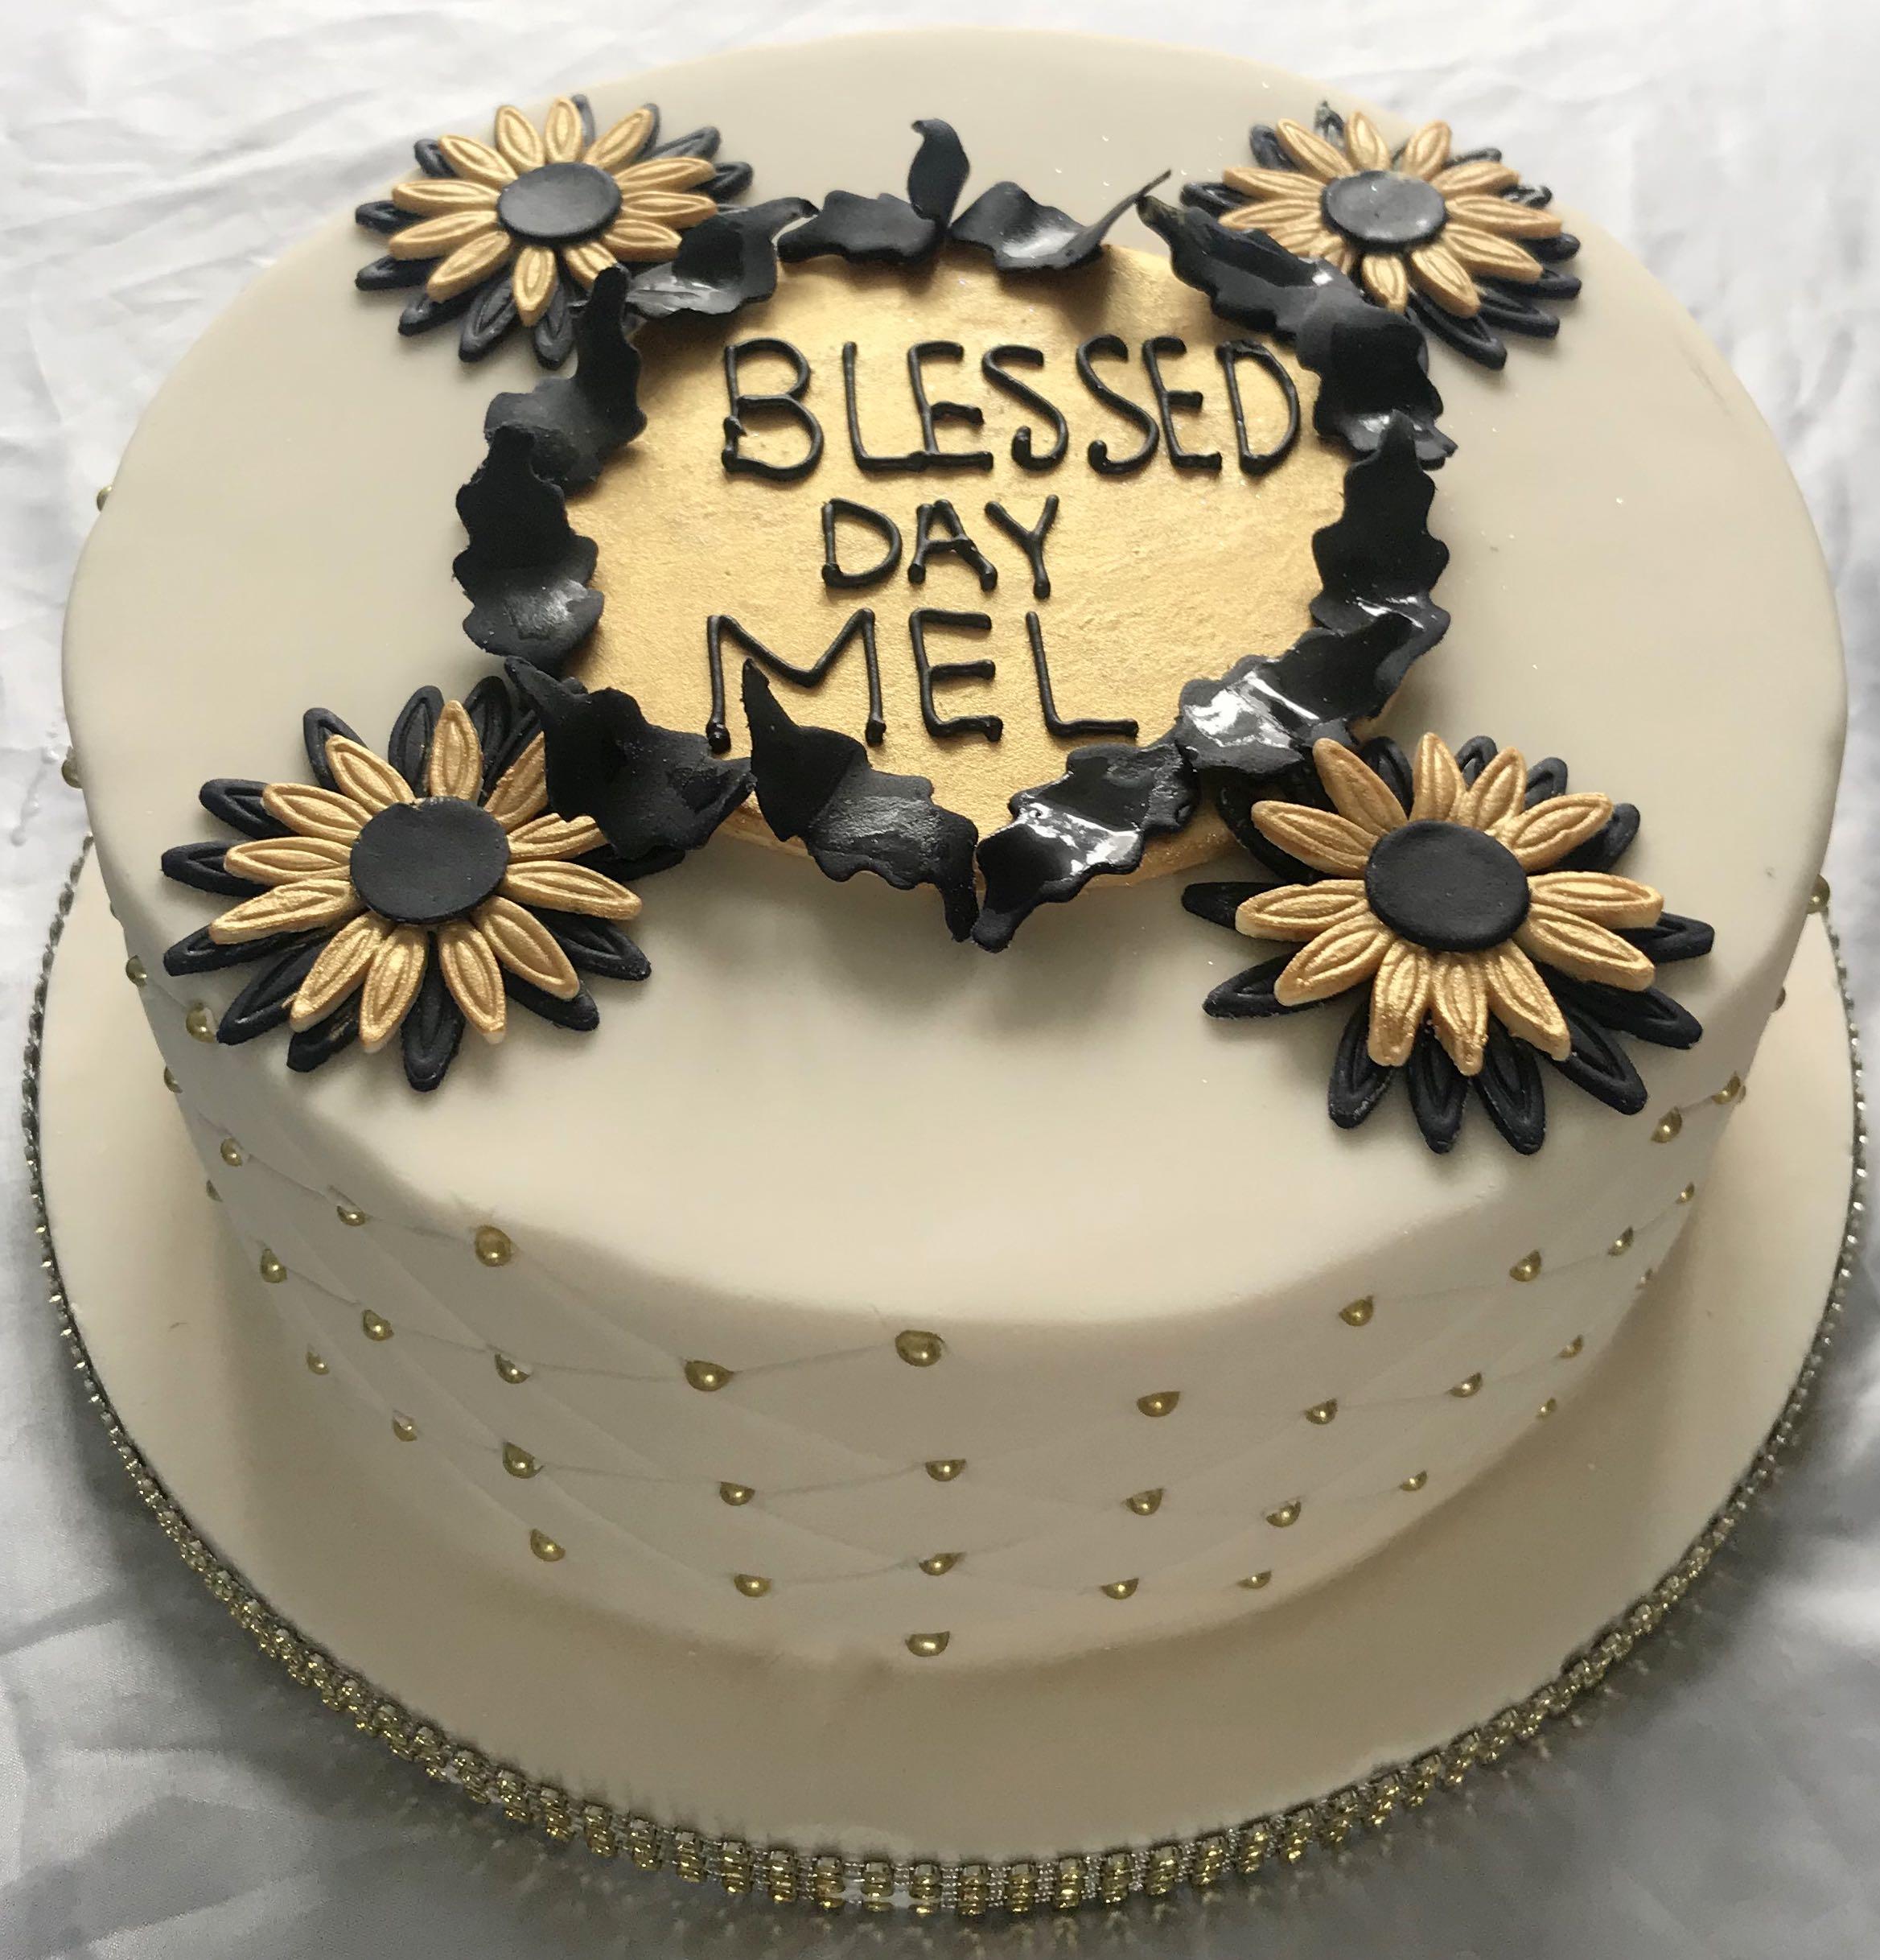 Blessed Birthday Cake